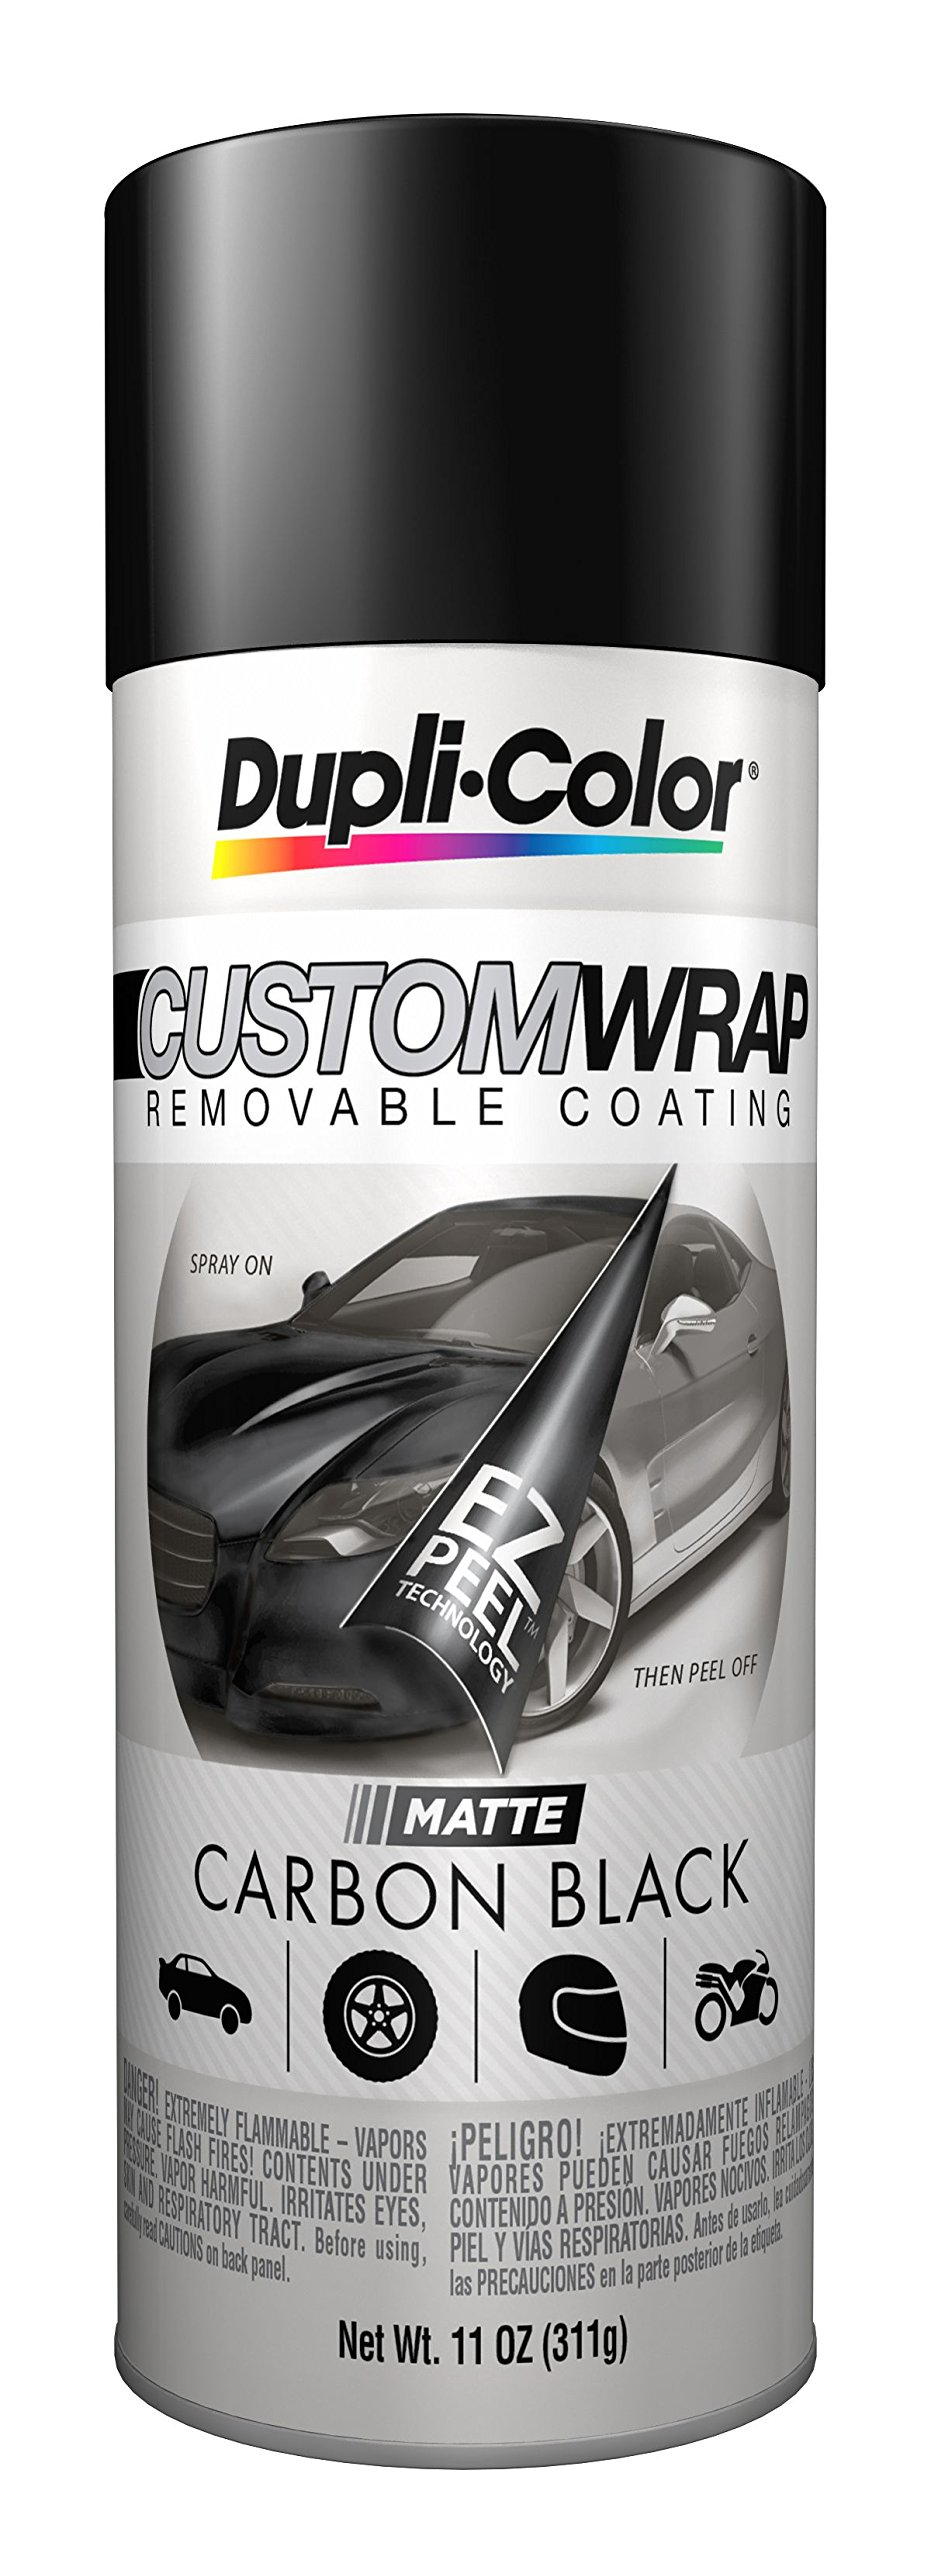 Dupli-Color CWRC794-6PK Custom Wrap Removable Coating - 11 fl. oz, (Pack of 6) by Dupli-Color